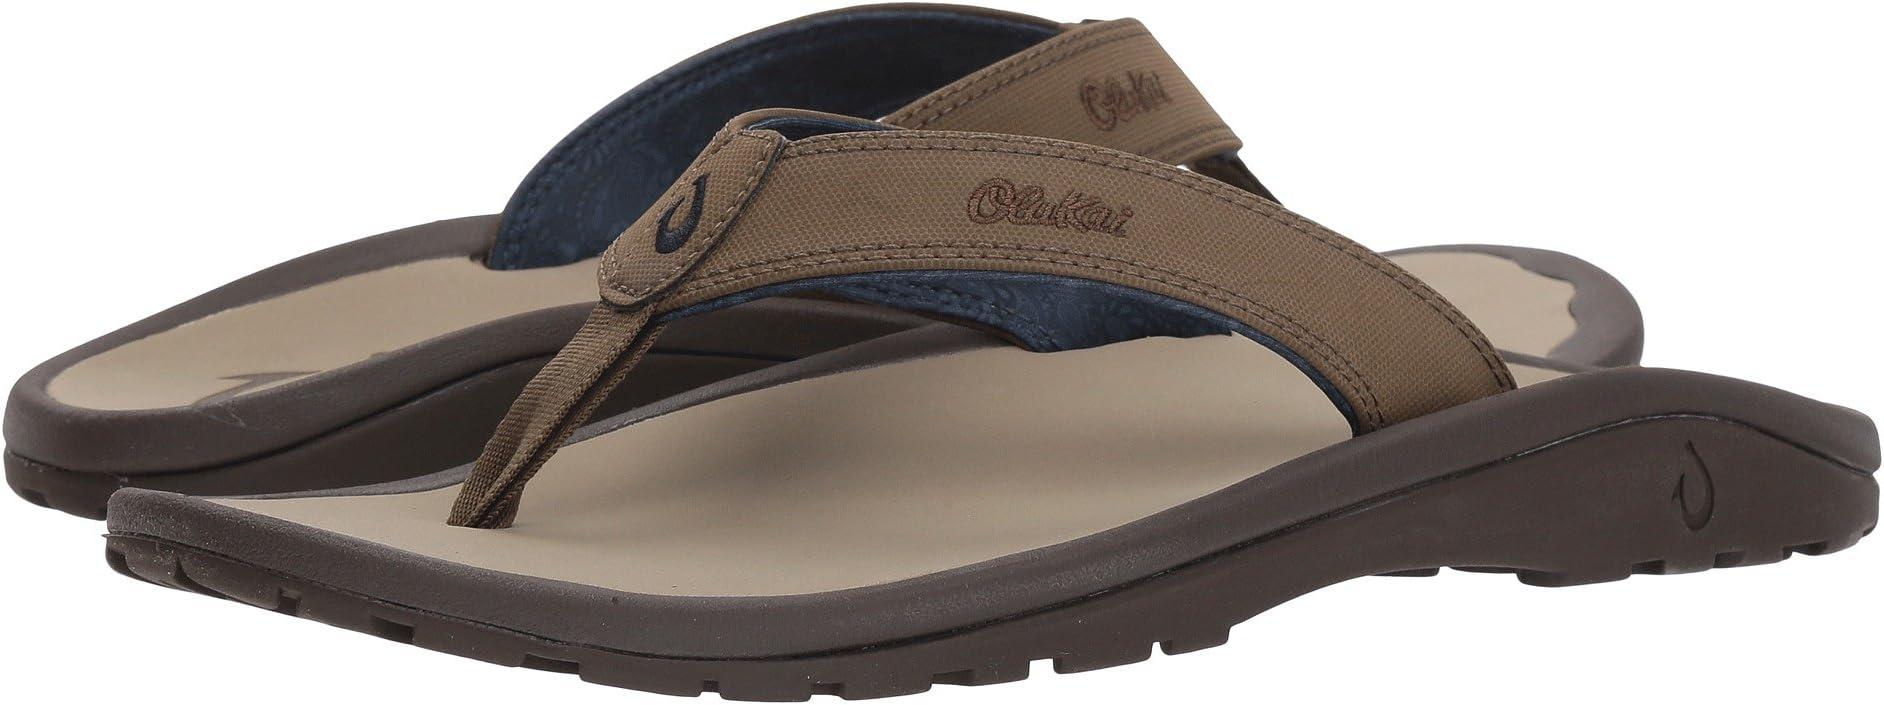 194a97f28 OluKai Sandals, Shoes & Boots | Zappos.com